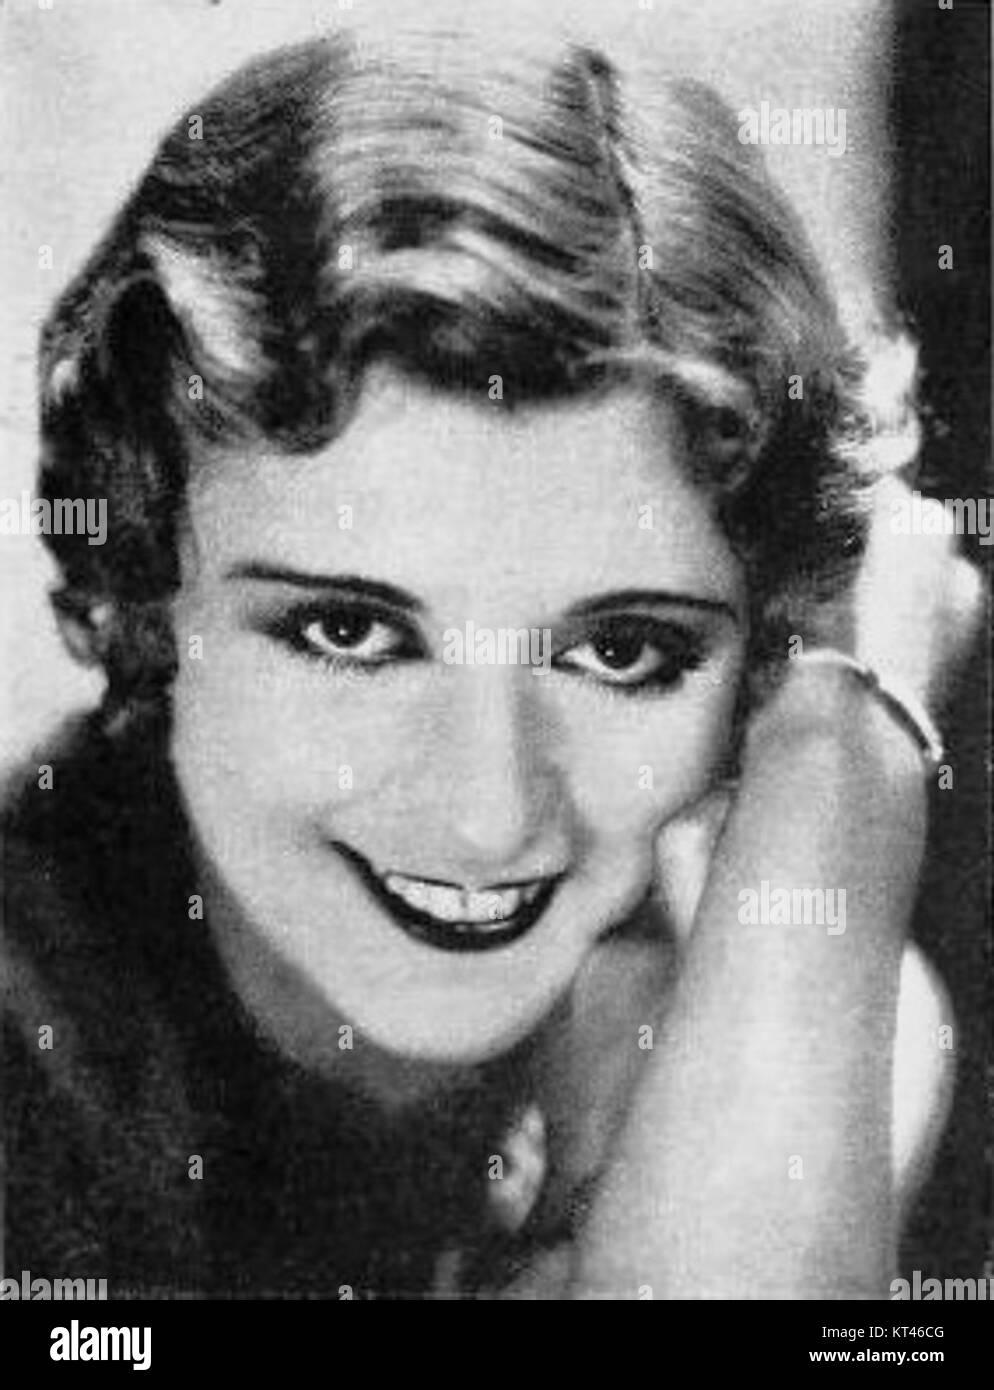 Norman Rossington (1928?999) pictures